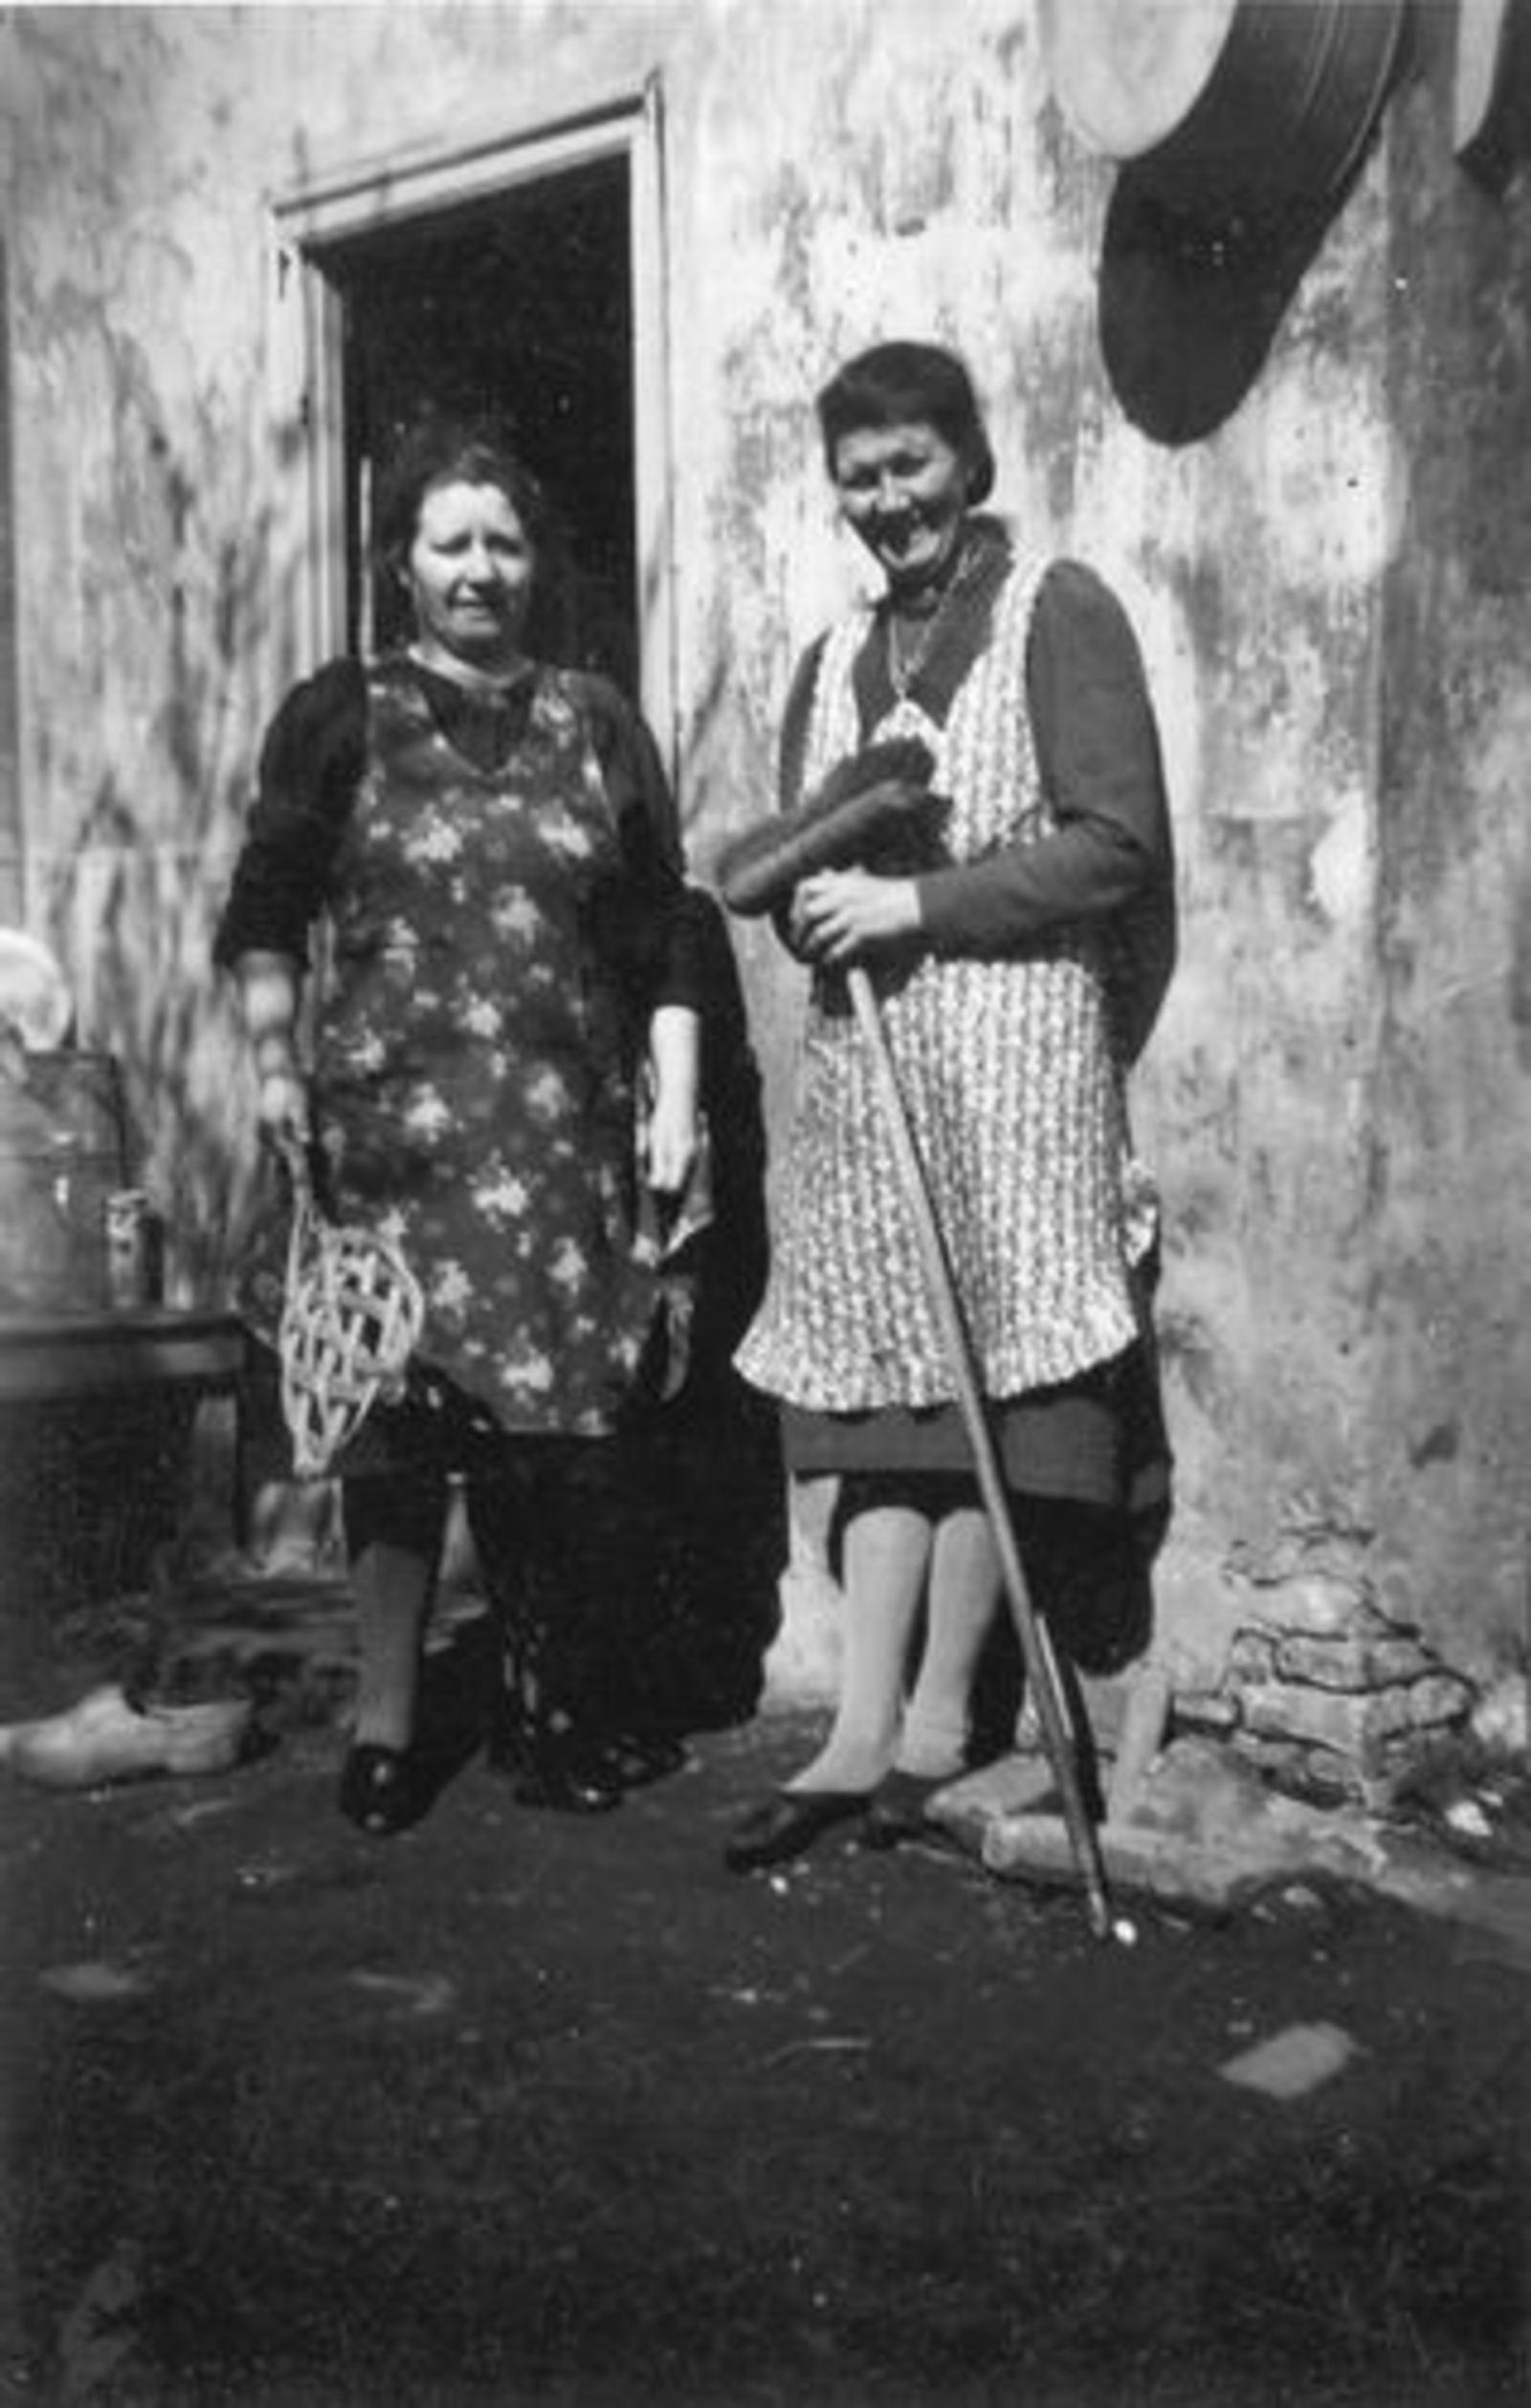 Galis Nanning 1946 vrouw Anna M vd Ban met mw Bosman-v Krimpen